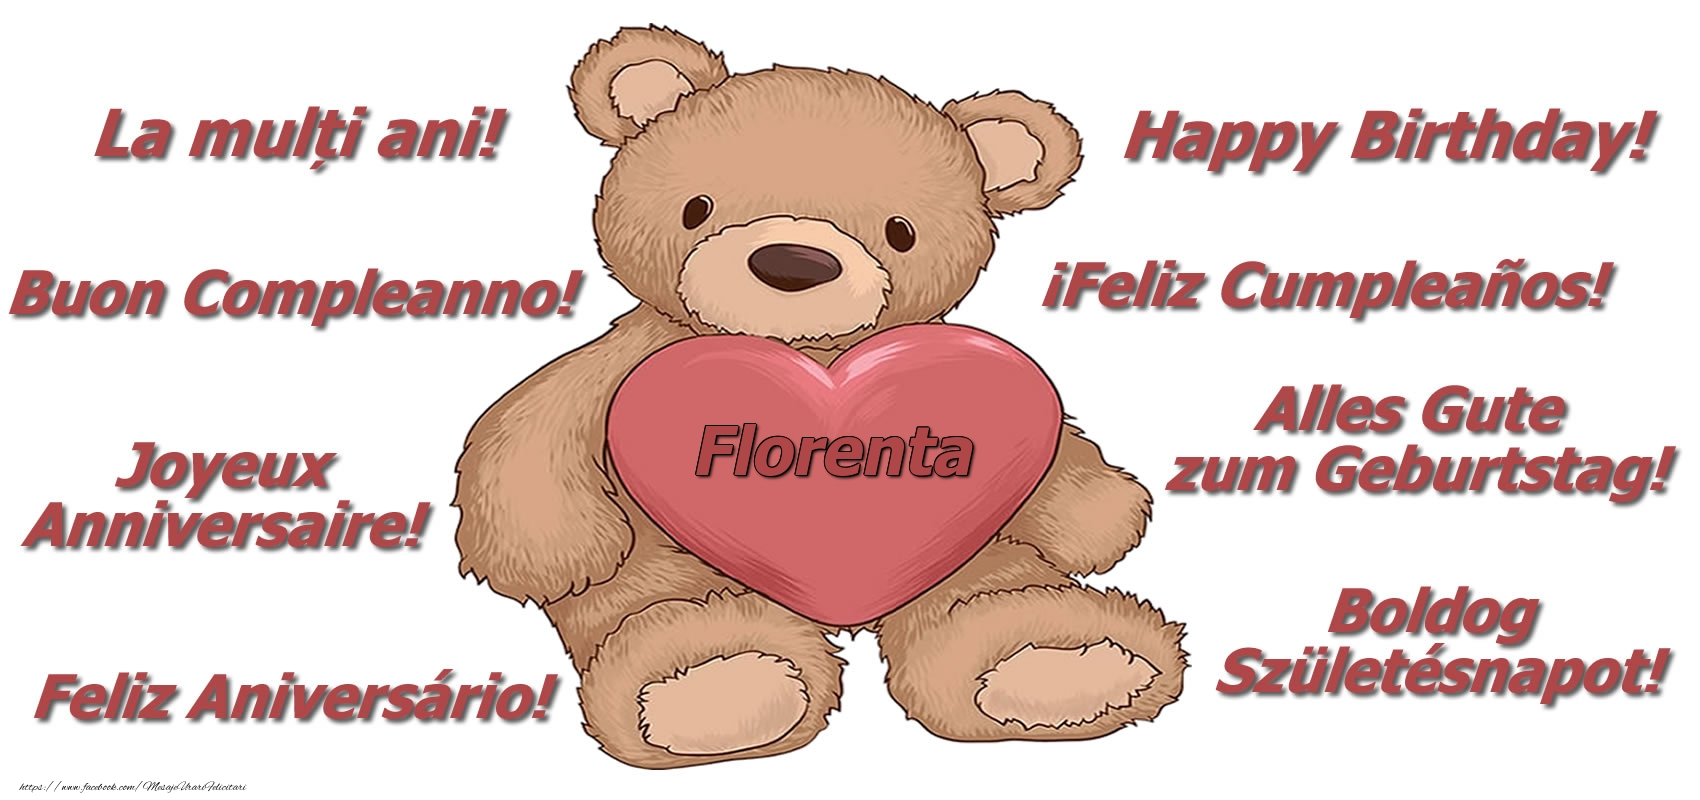 Felicitari de zi de nastere - La multi ani Florenta! - Ursulet